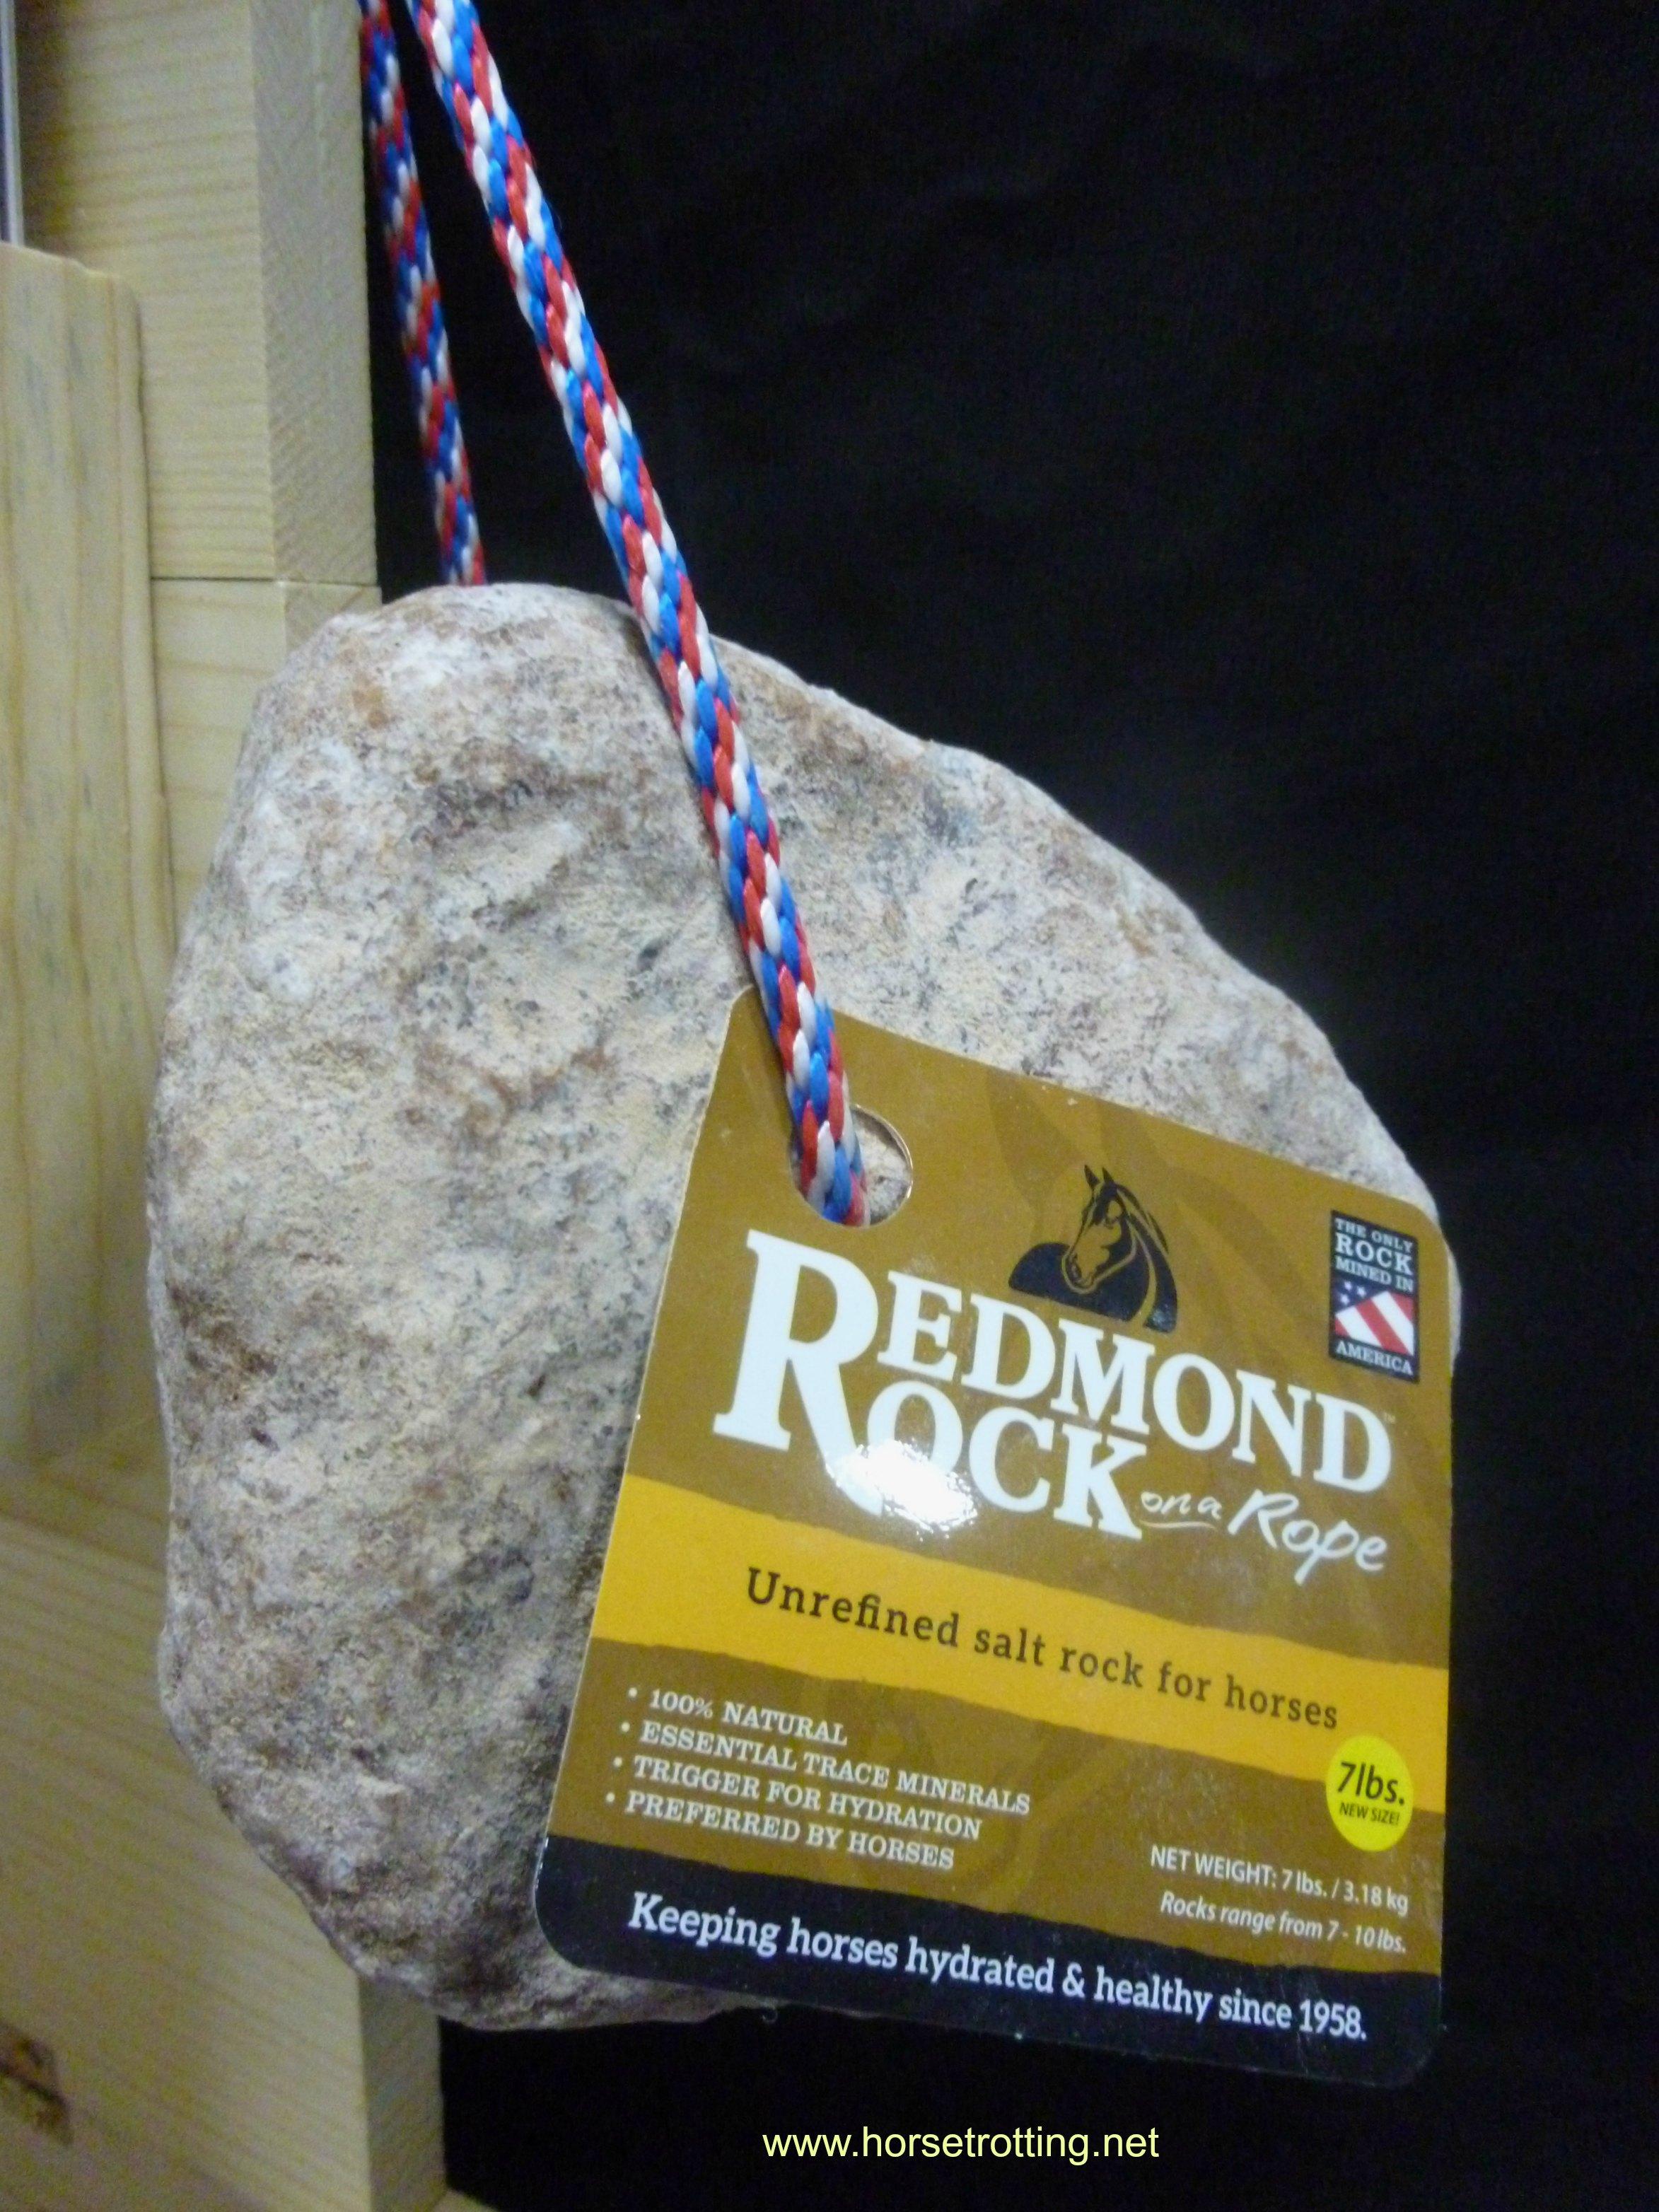 Redmond Rock salt rock for horses